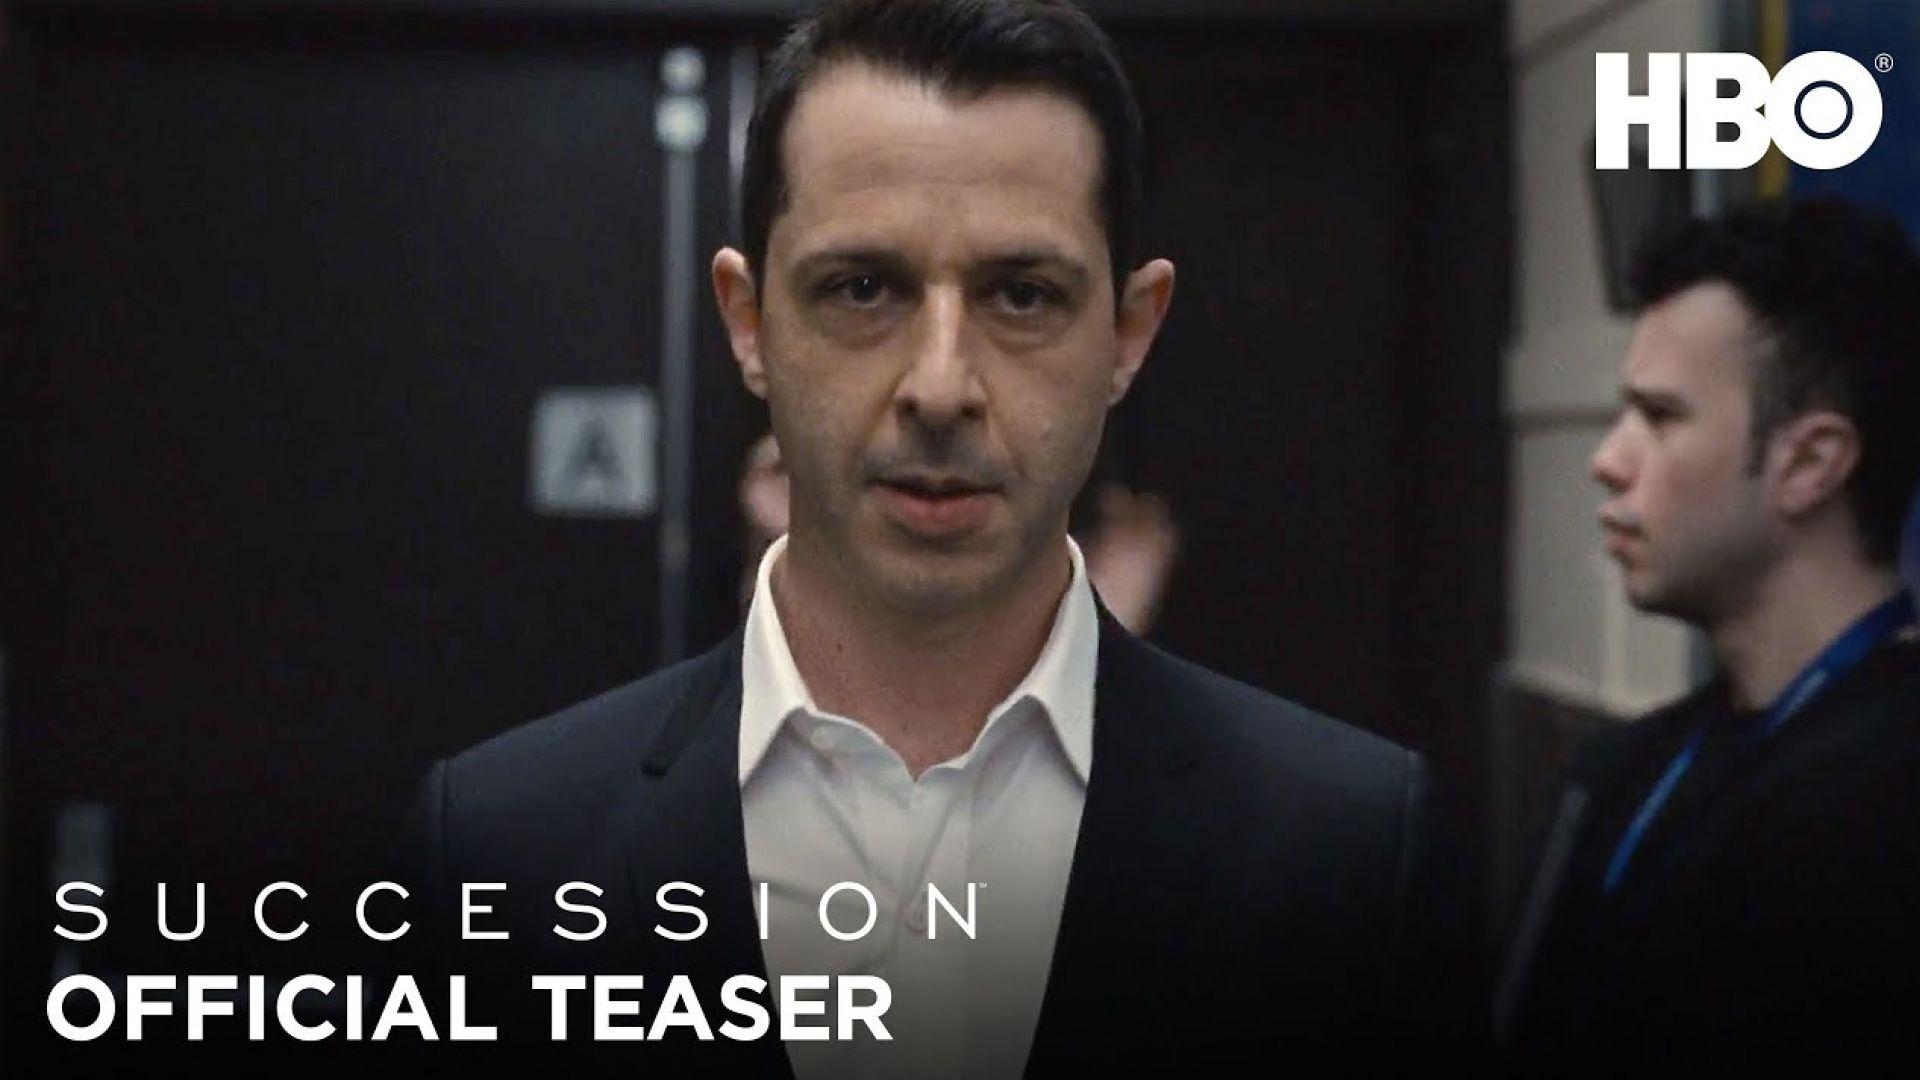 'Succession' Season 3 Trailer